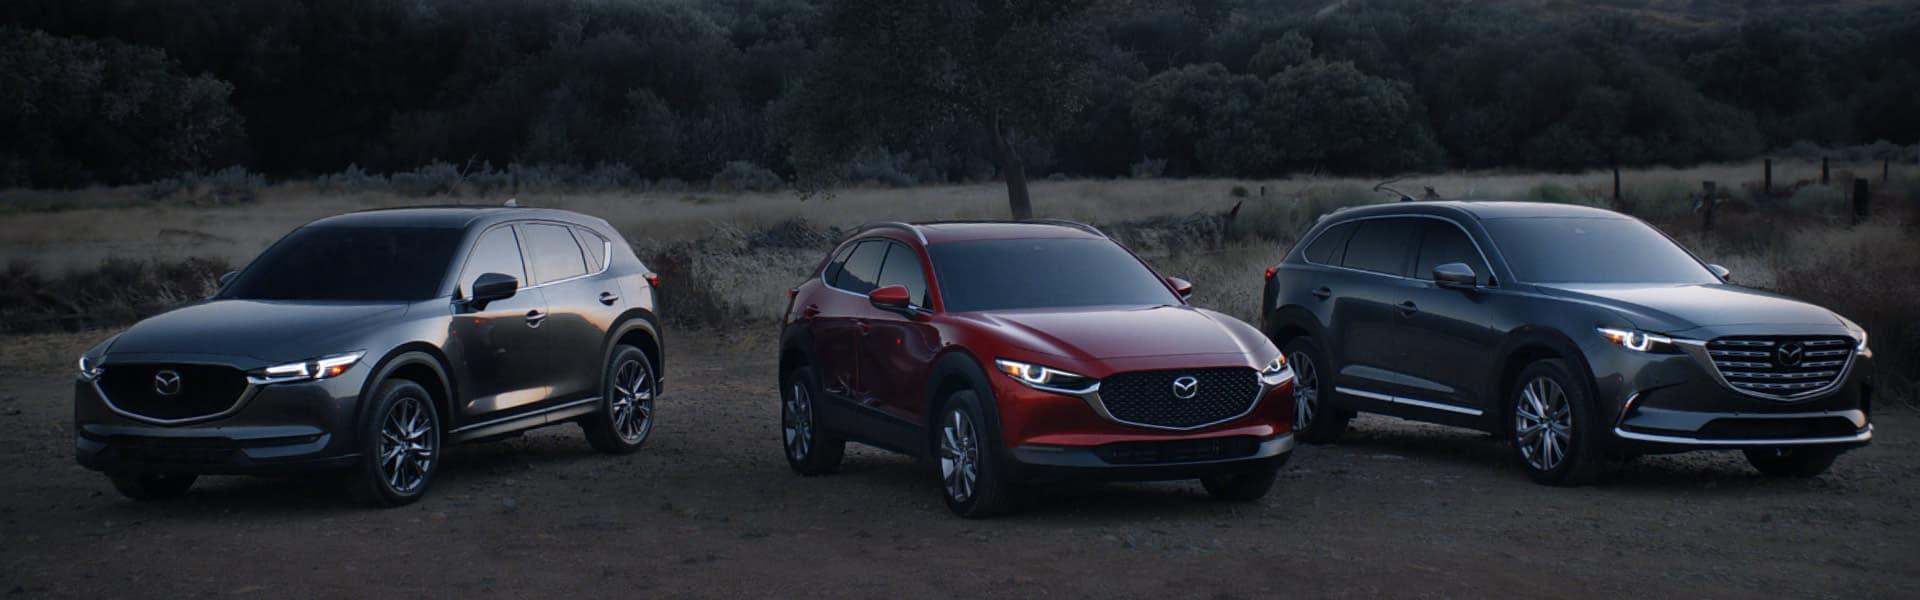 Mazda 2021 CUV Line-up